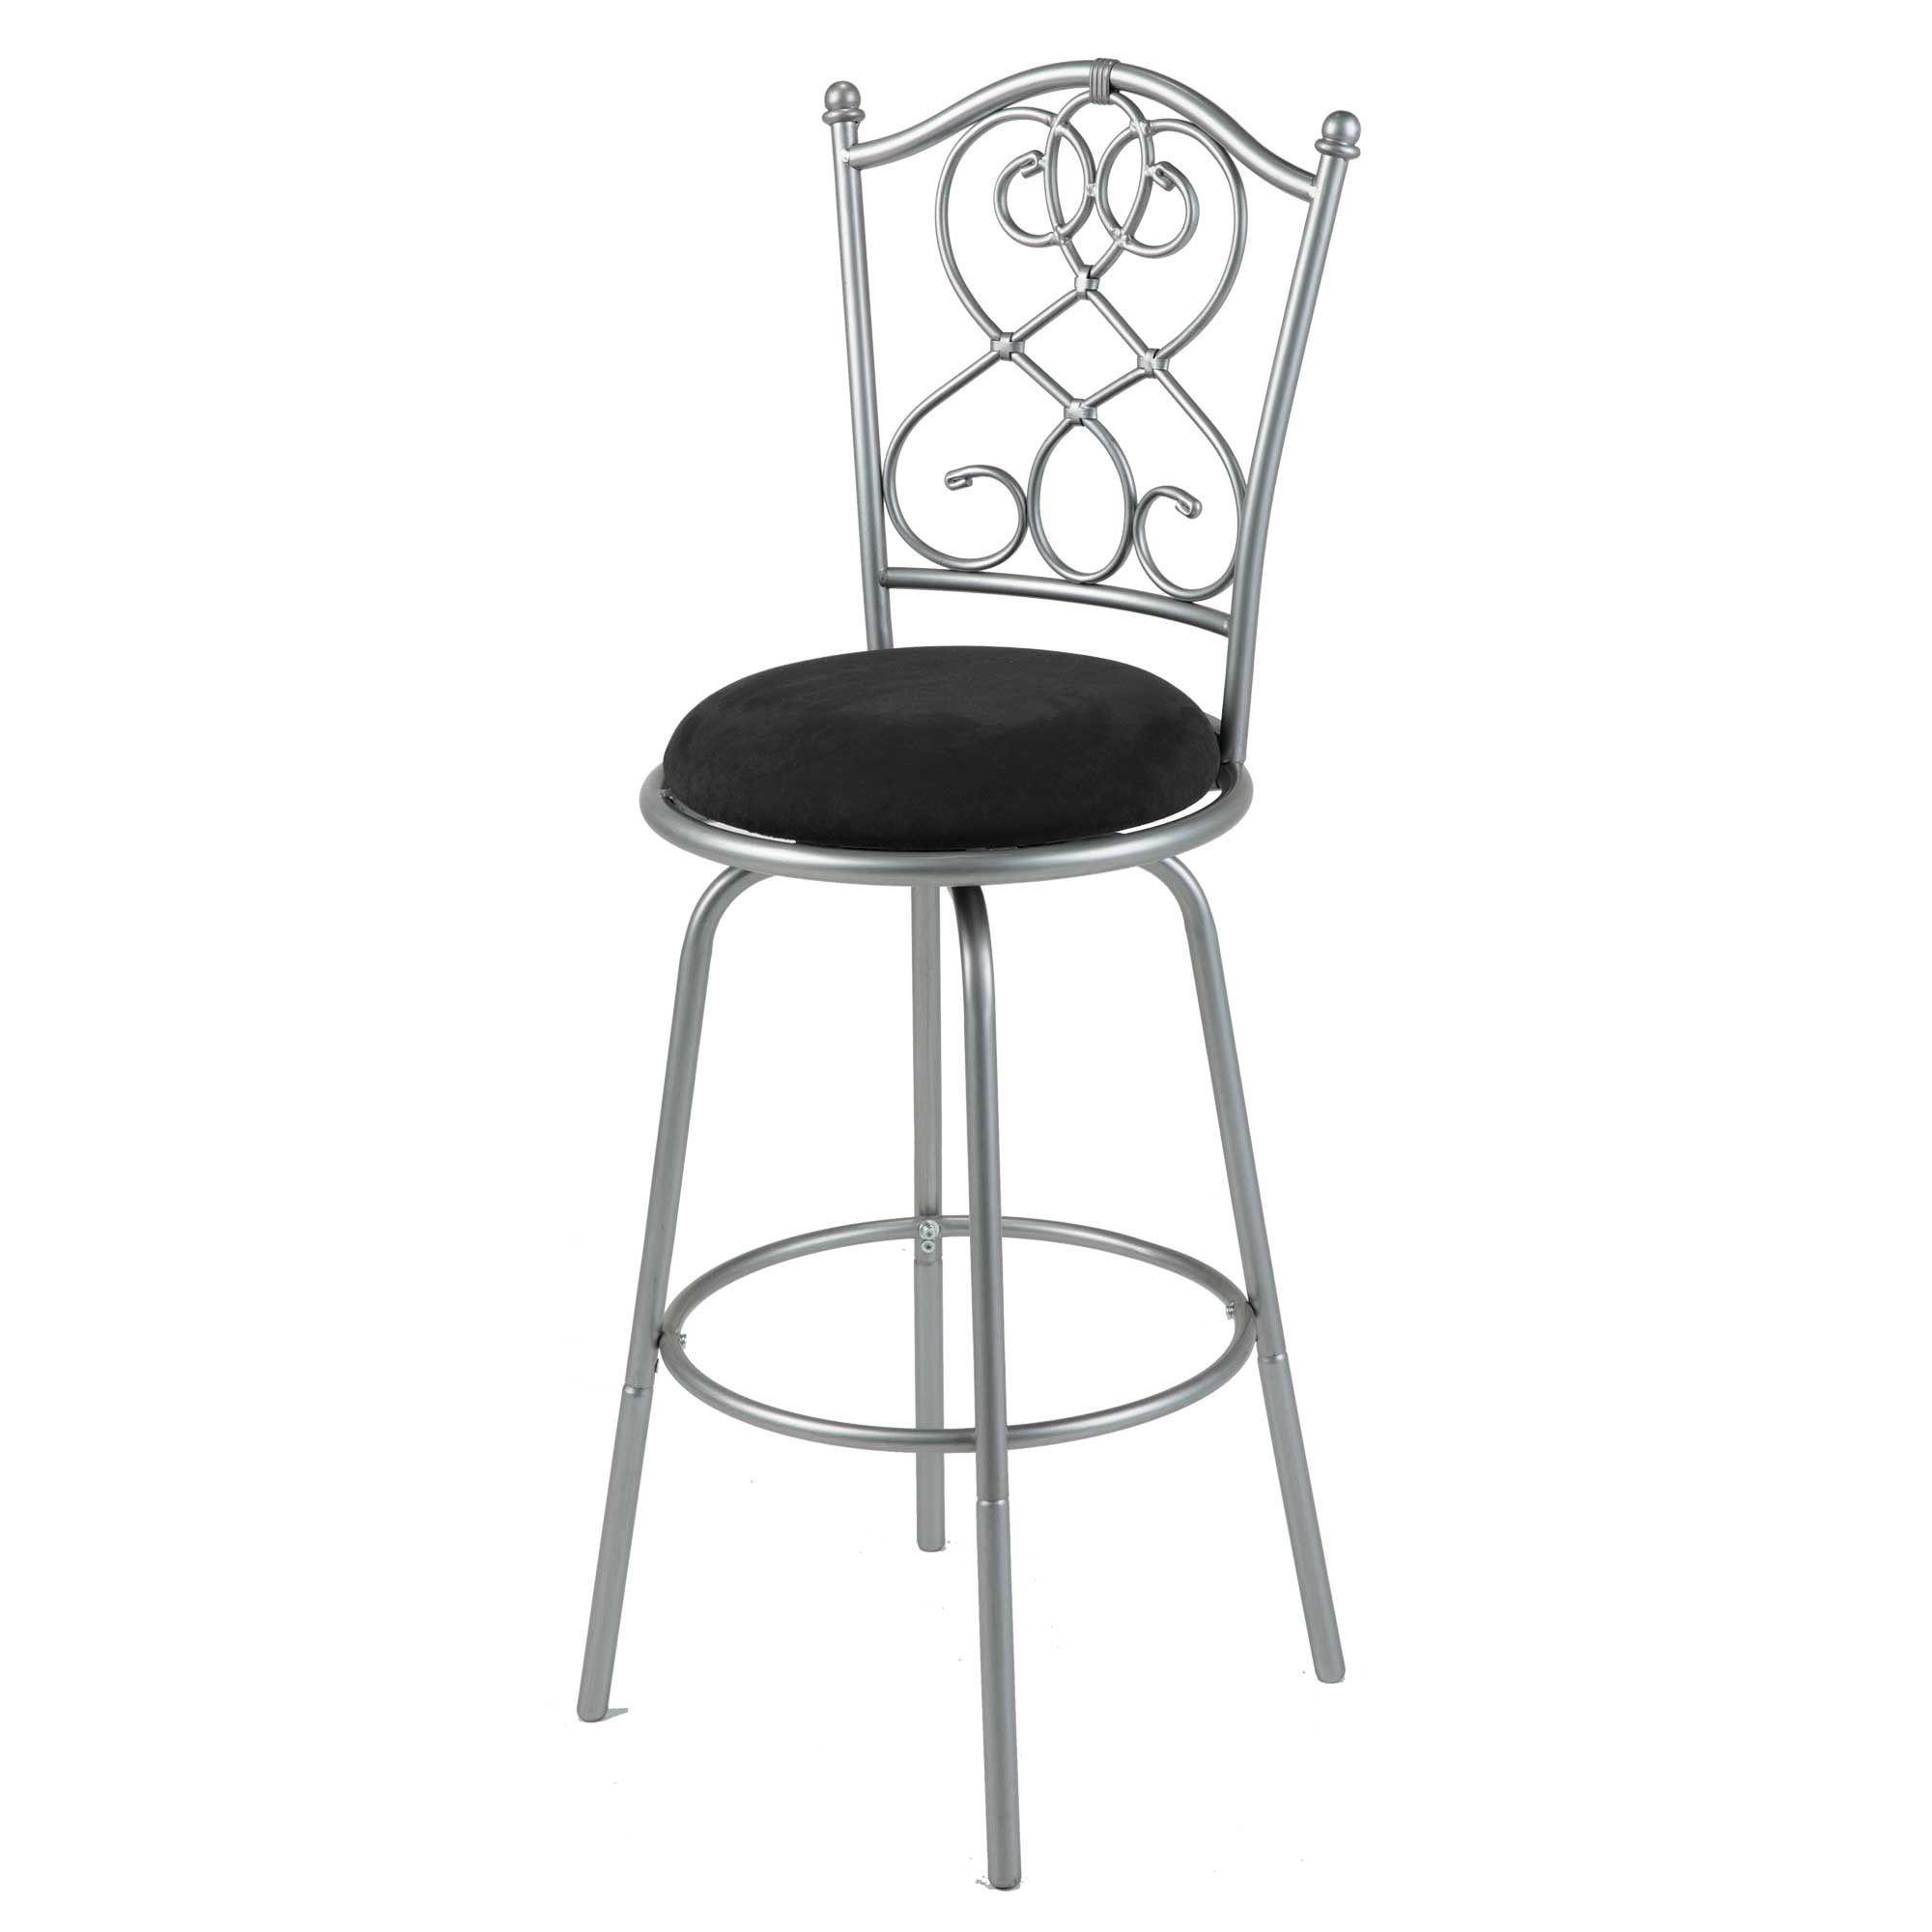 33908d82b45 Atlanta 30-inch Tall Barstool by Fashion Home (30 bar height ...